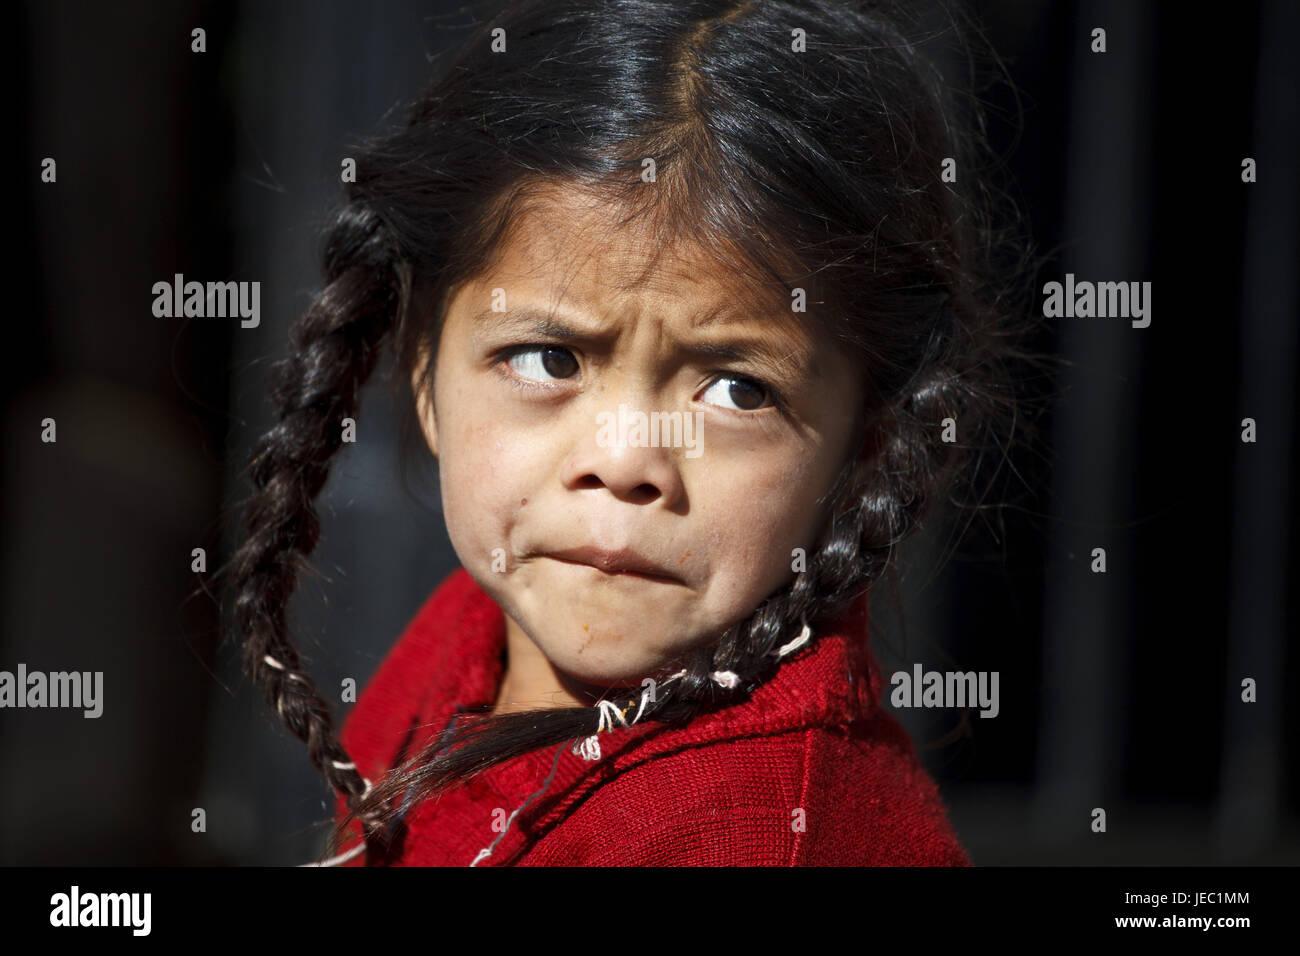 Guatemala, Solola, market, girl, Maya, no model release, - Stock Image